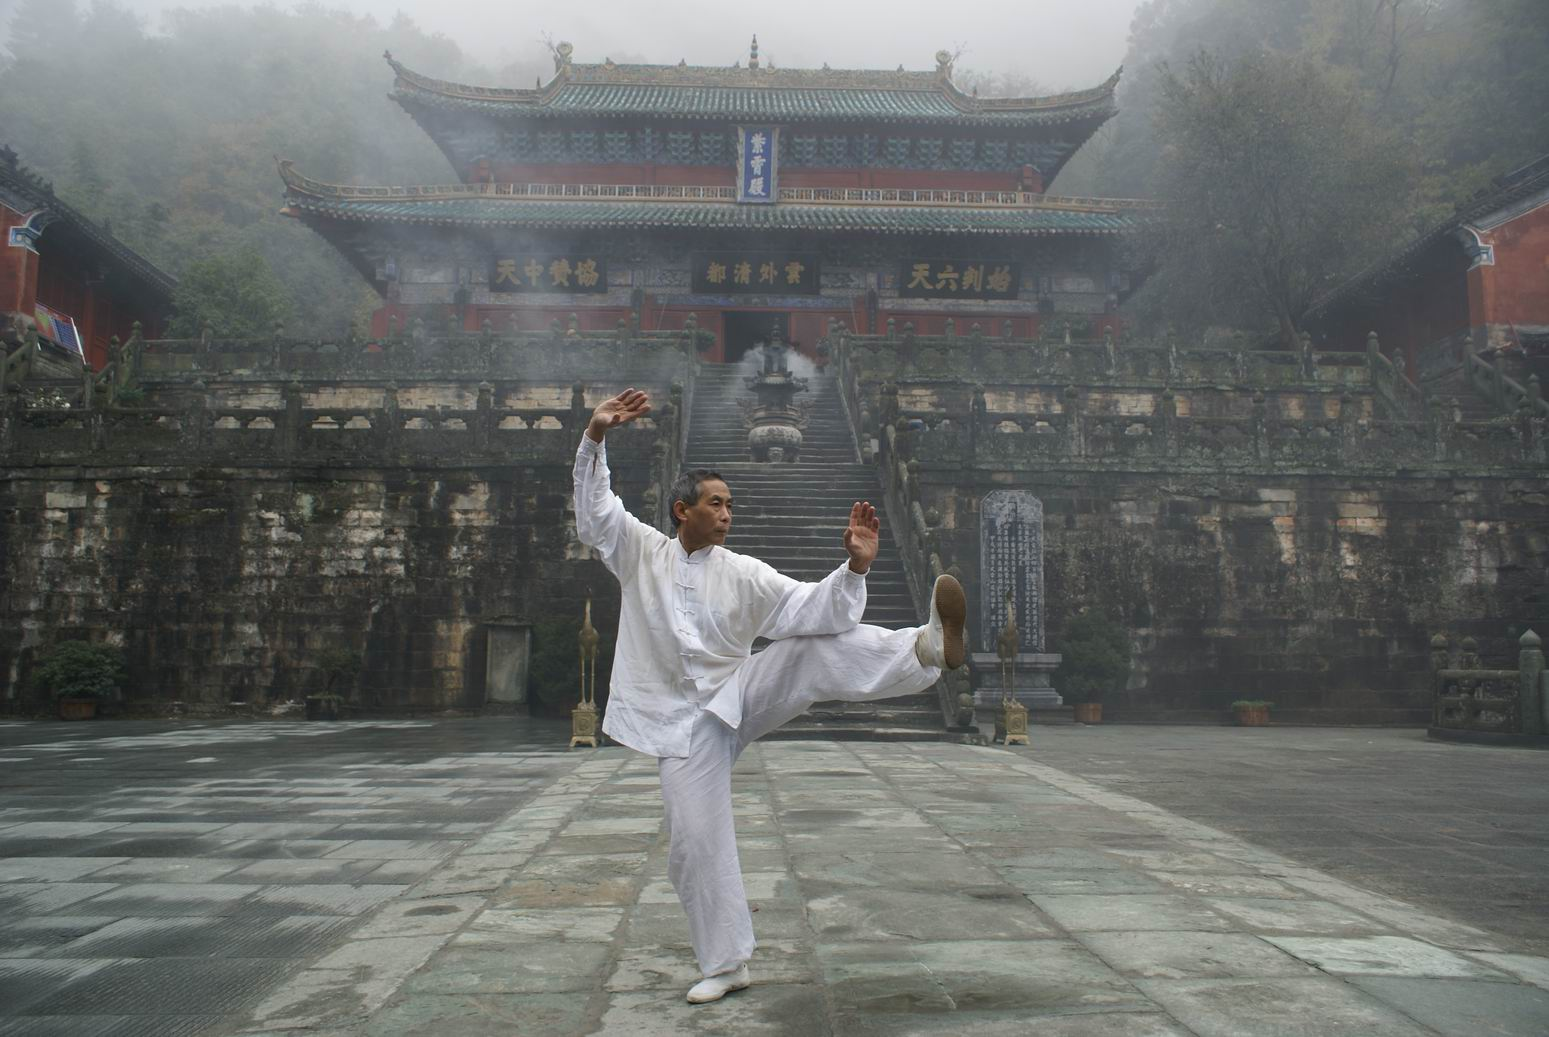 Китайская медицина багуа calme медпрепарат